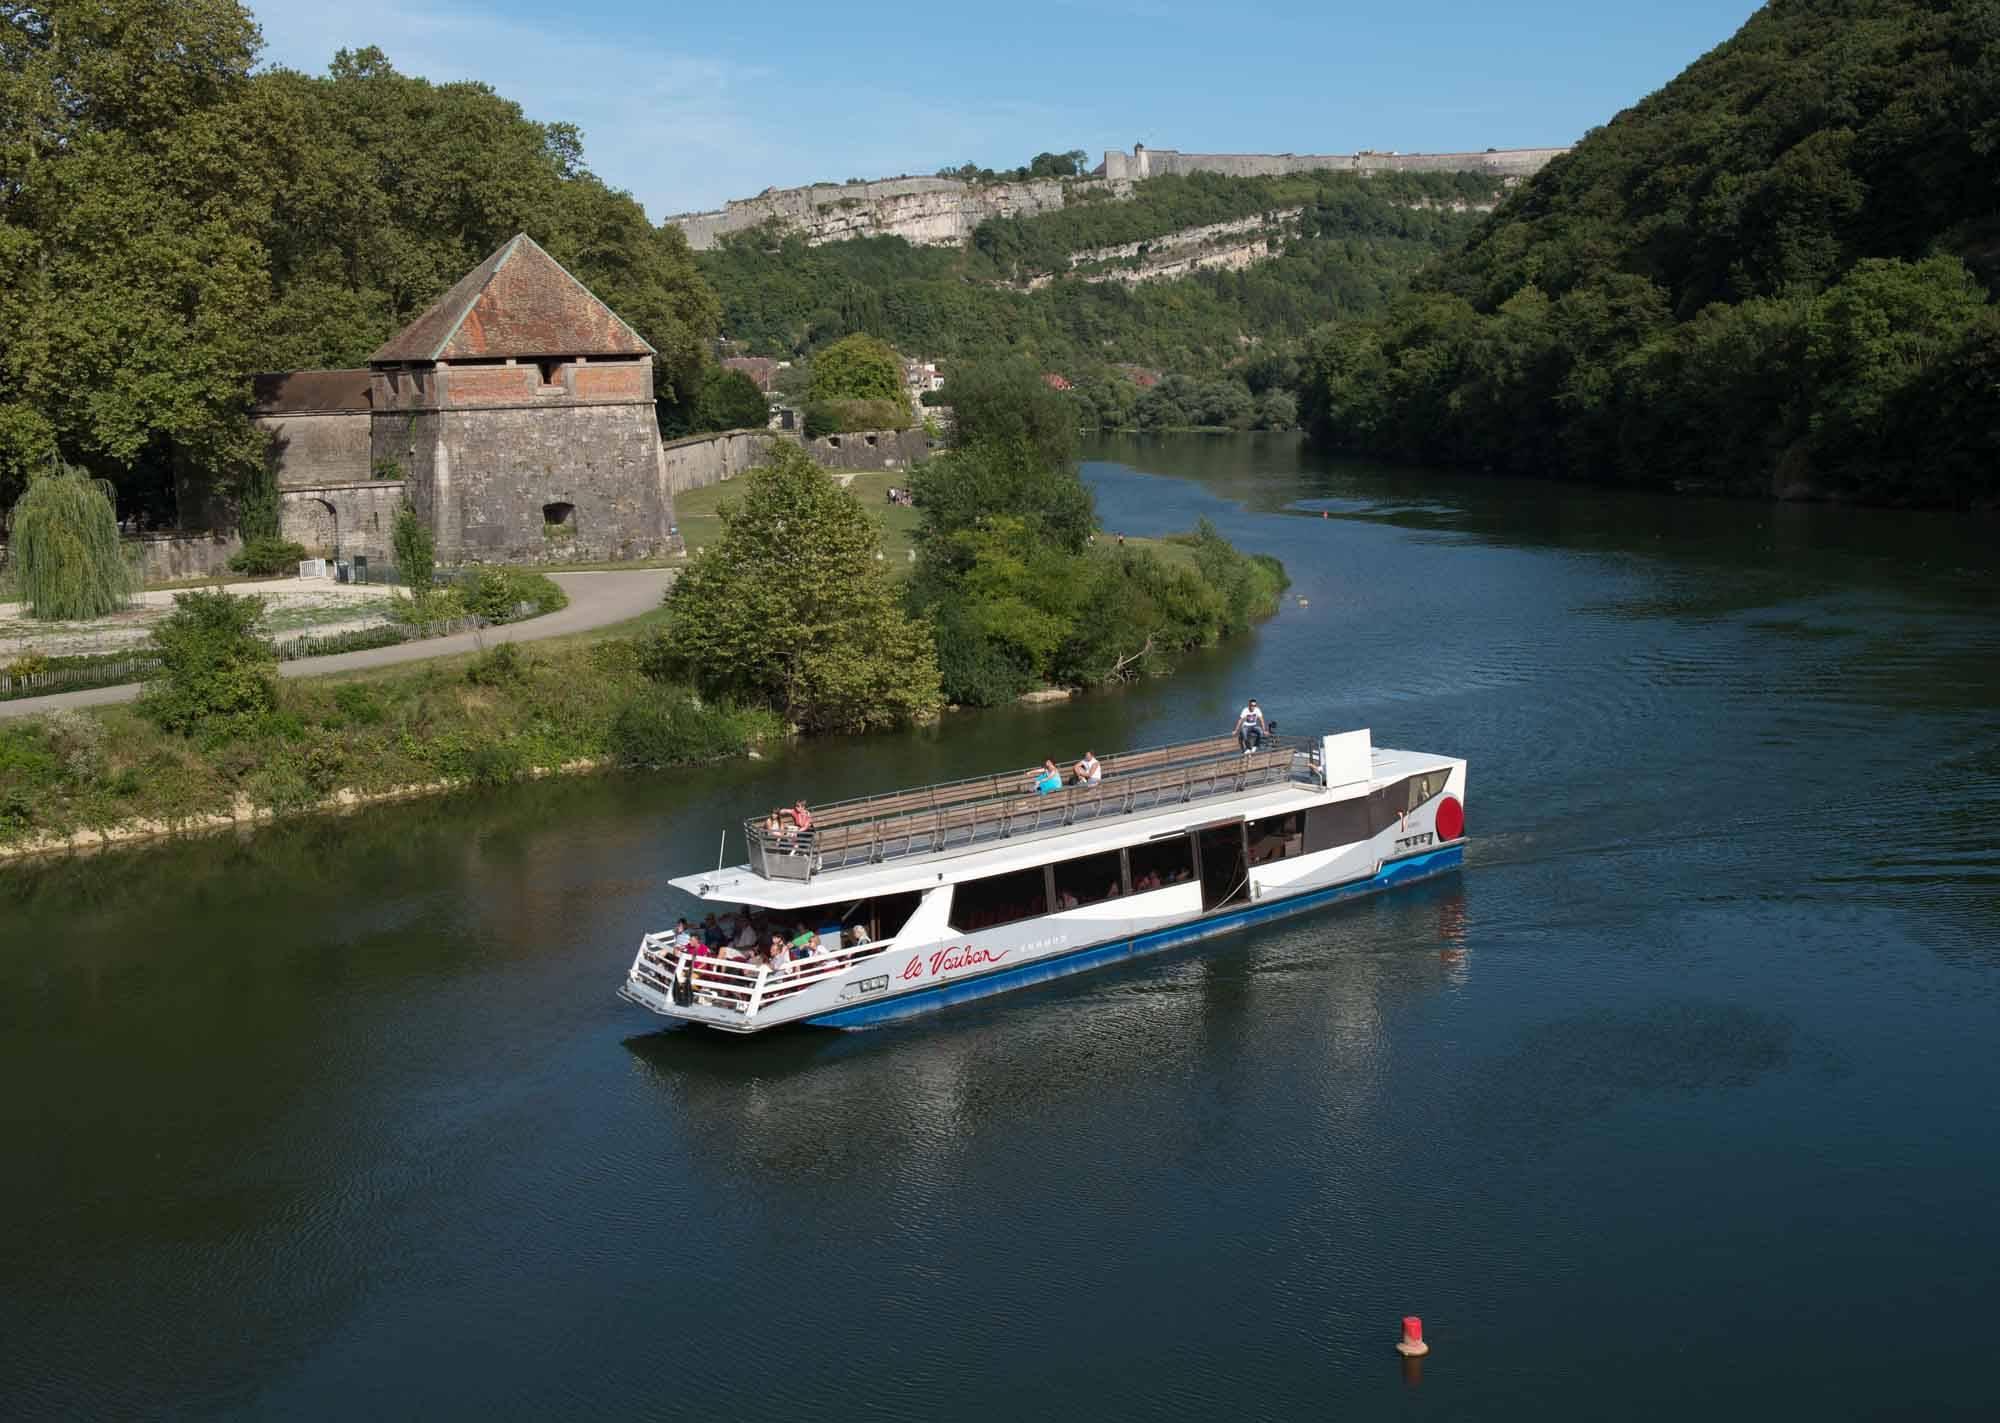 bateau-le-vauban-besancon-27c0cc5c73b94b67a1e0fc186cc54da8